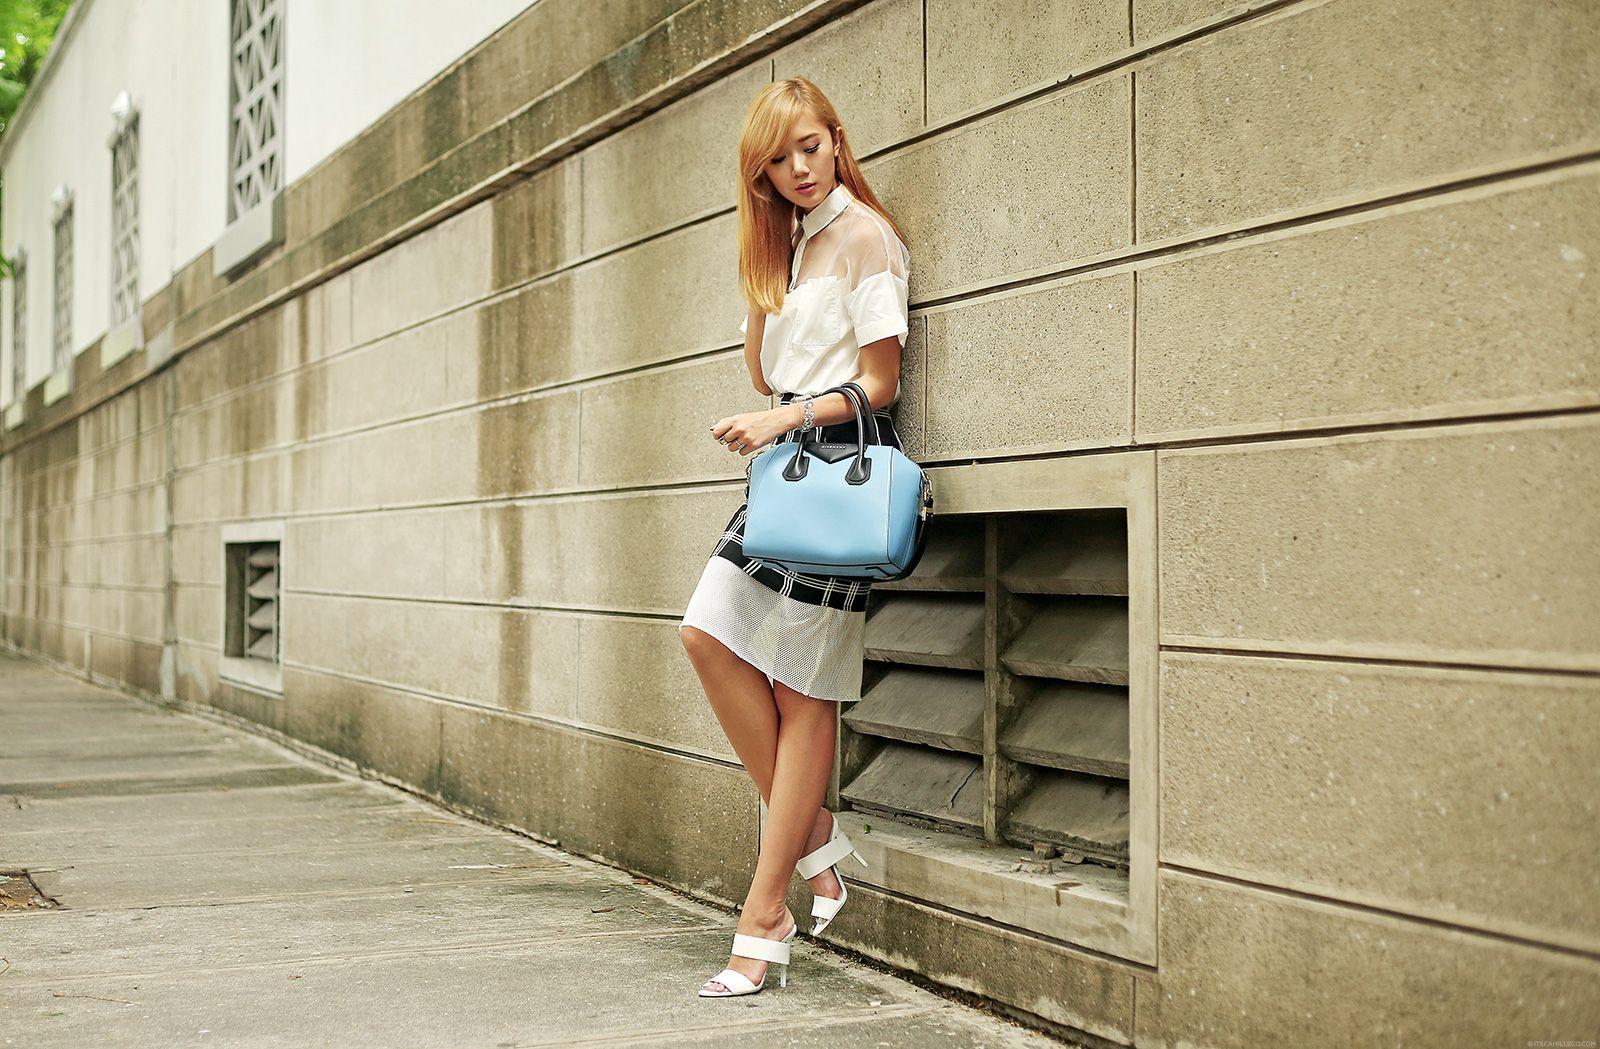 6ks and Stylenanda Corporate Fashion | itscamilleco.com